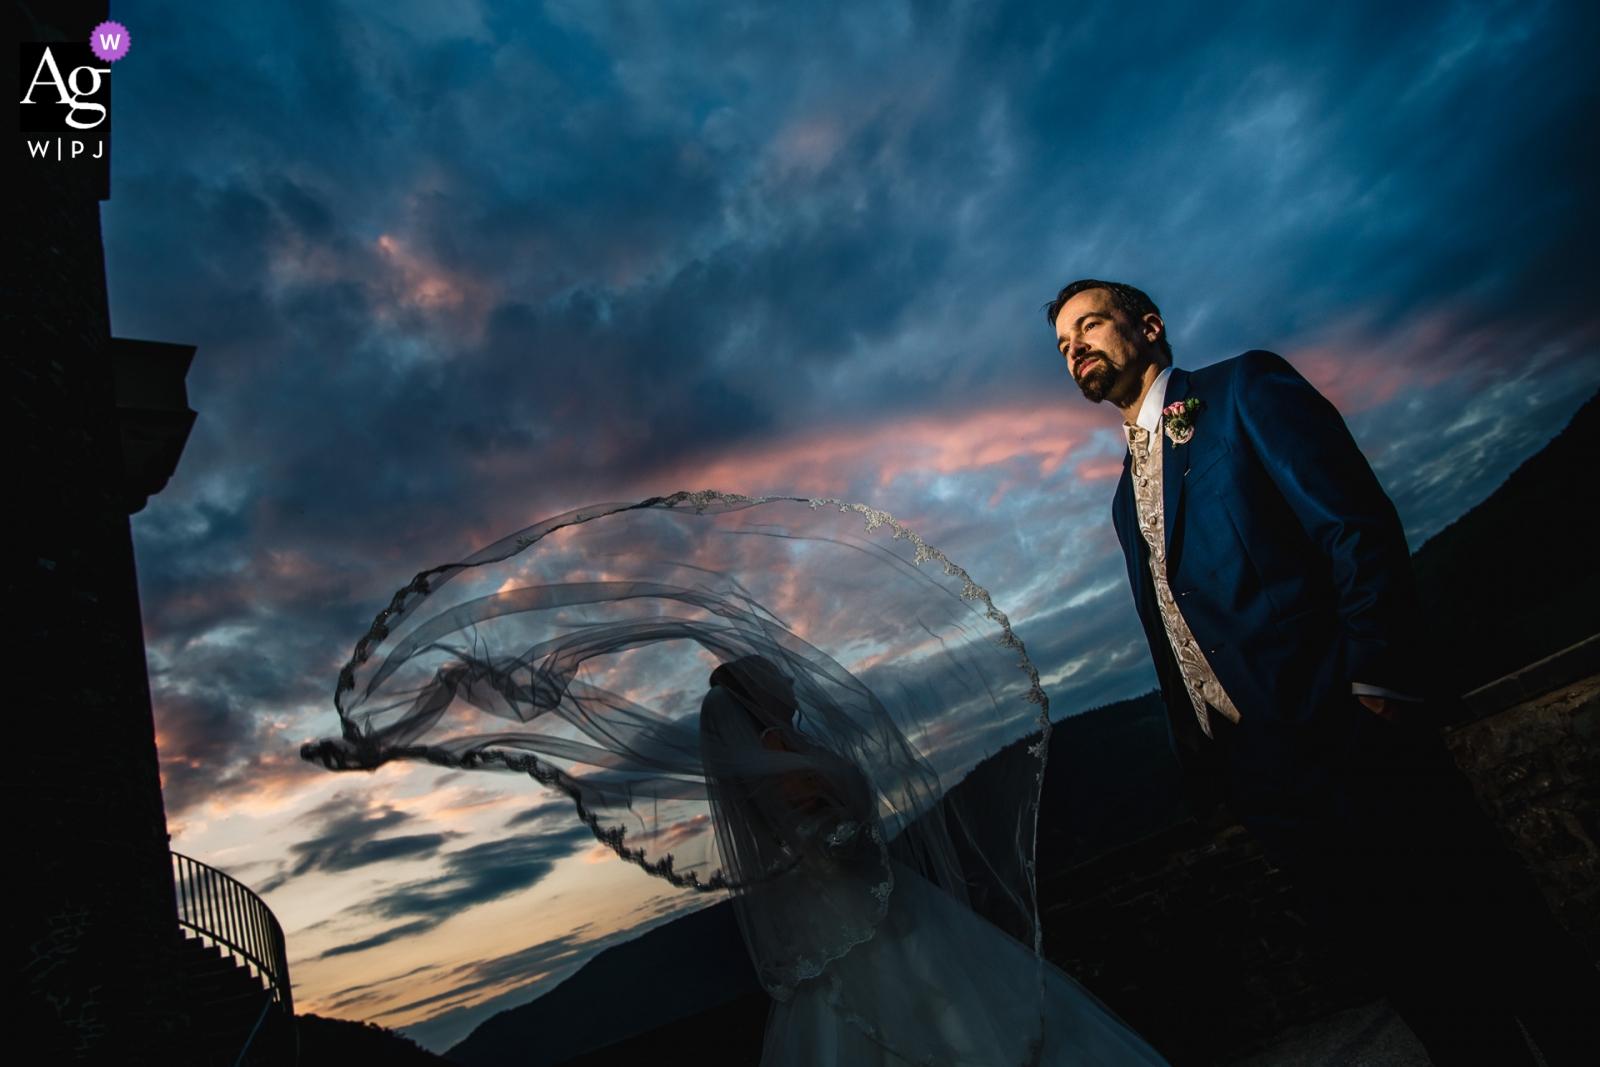 Andreas Pollok is an artistic wedding photographer for Baden-Württemberg